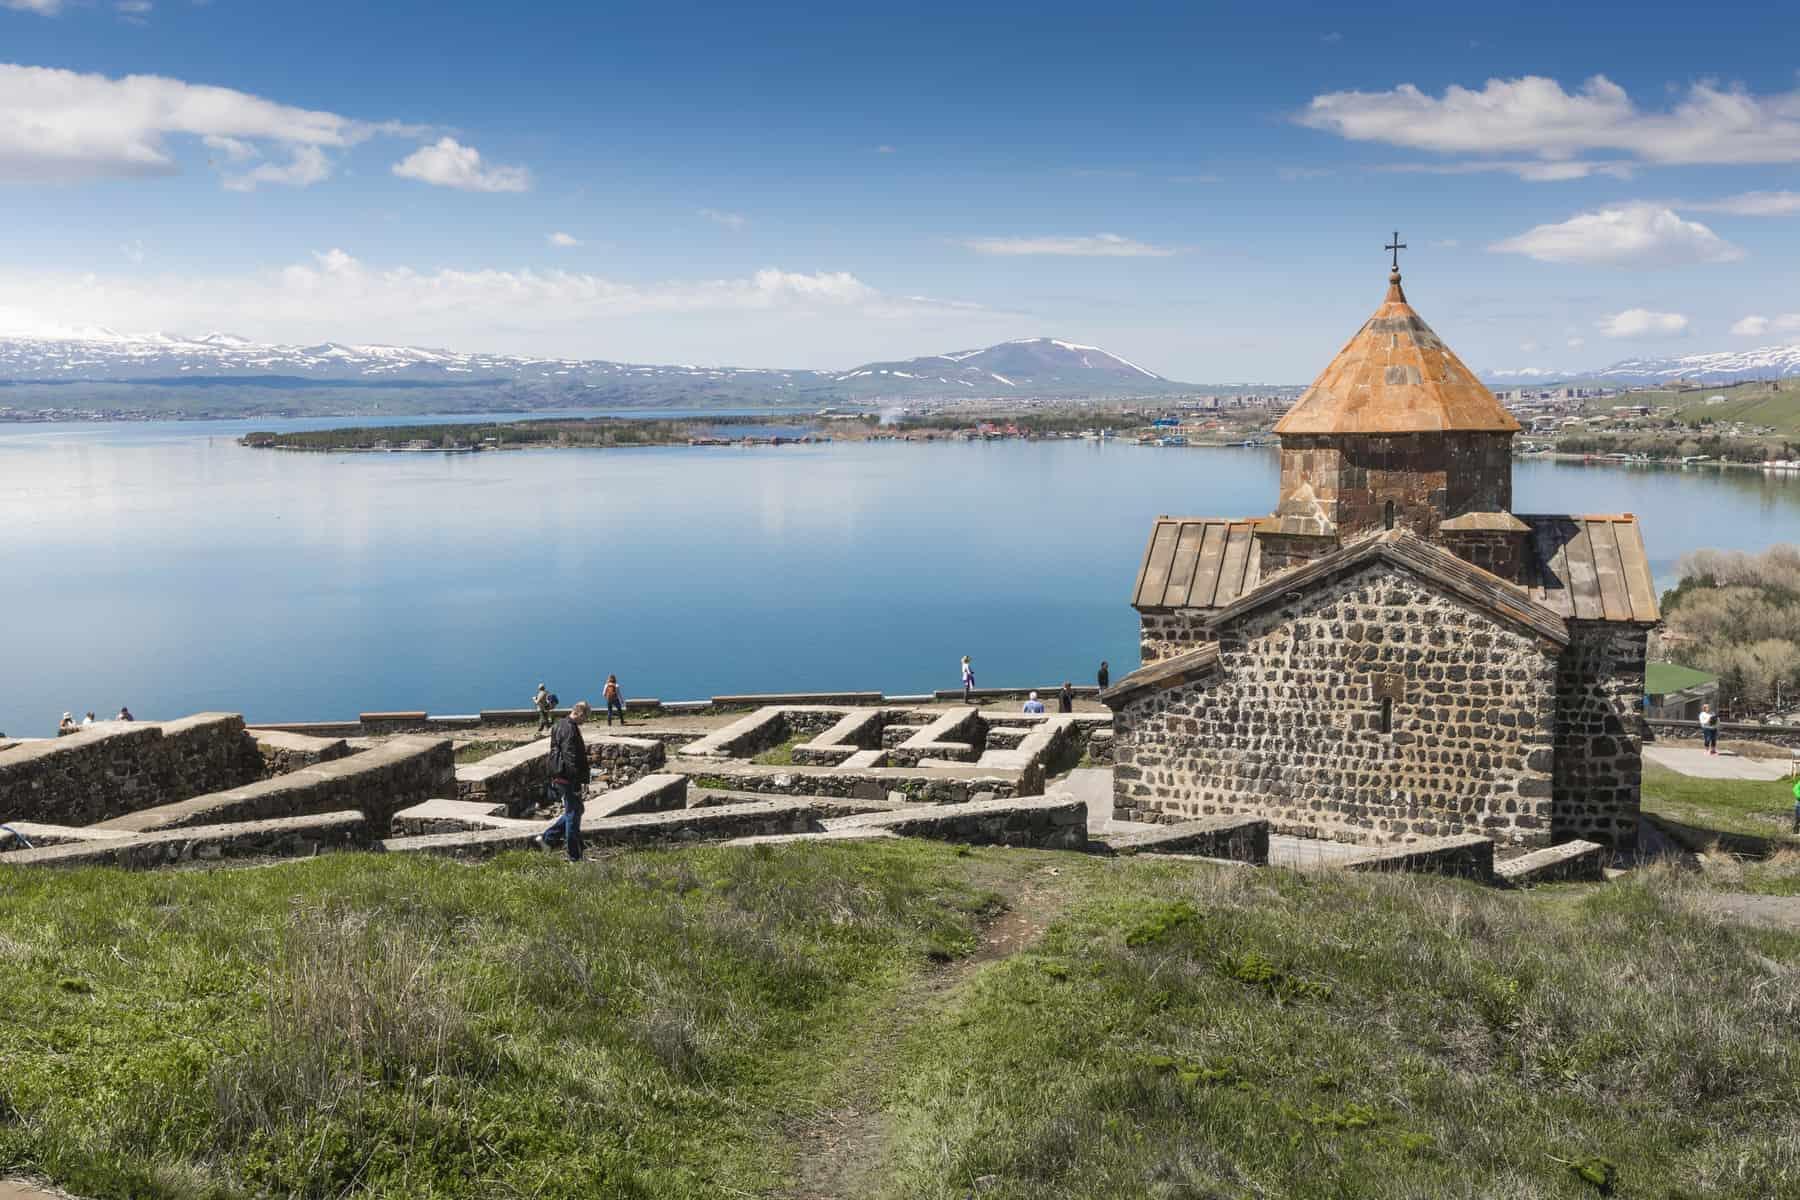 The 9th century Armenian monastery of Sevanavank at lake Sevan